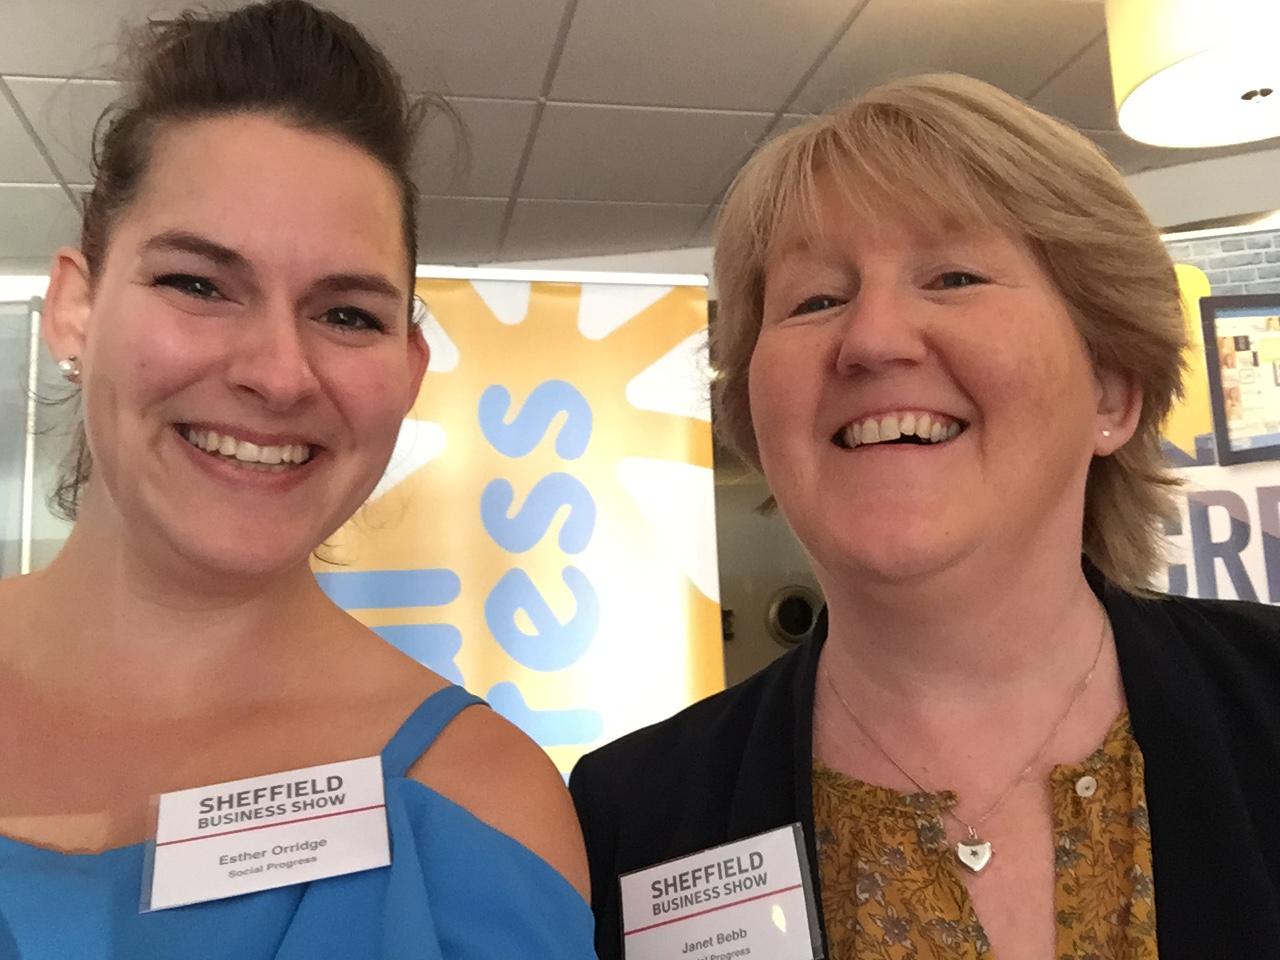 Social Progress at Sheffield Business Show